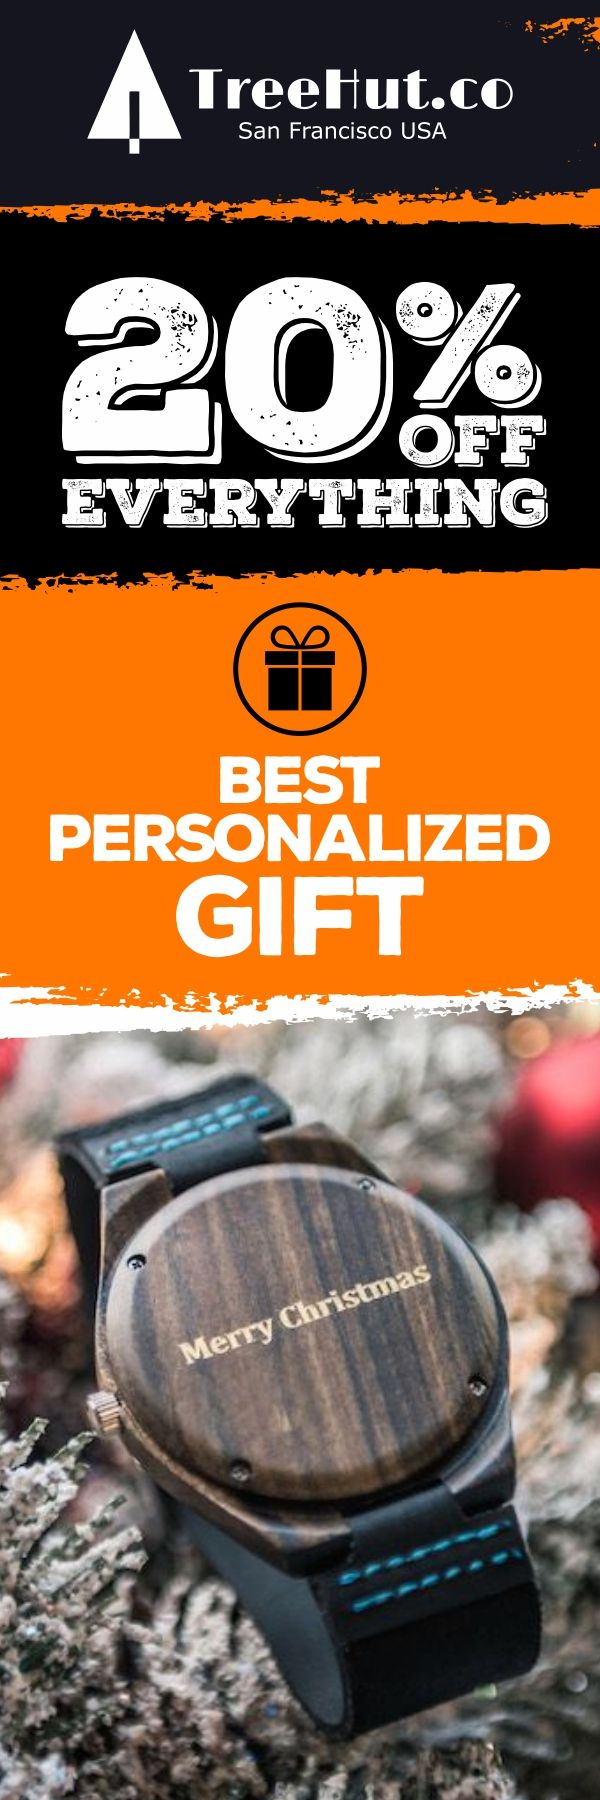 601 best Gift ideas. images on Pinterest   Boyfriend gift ideas ...